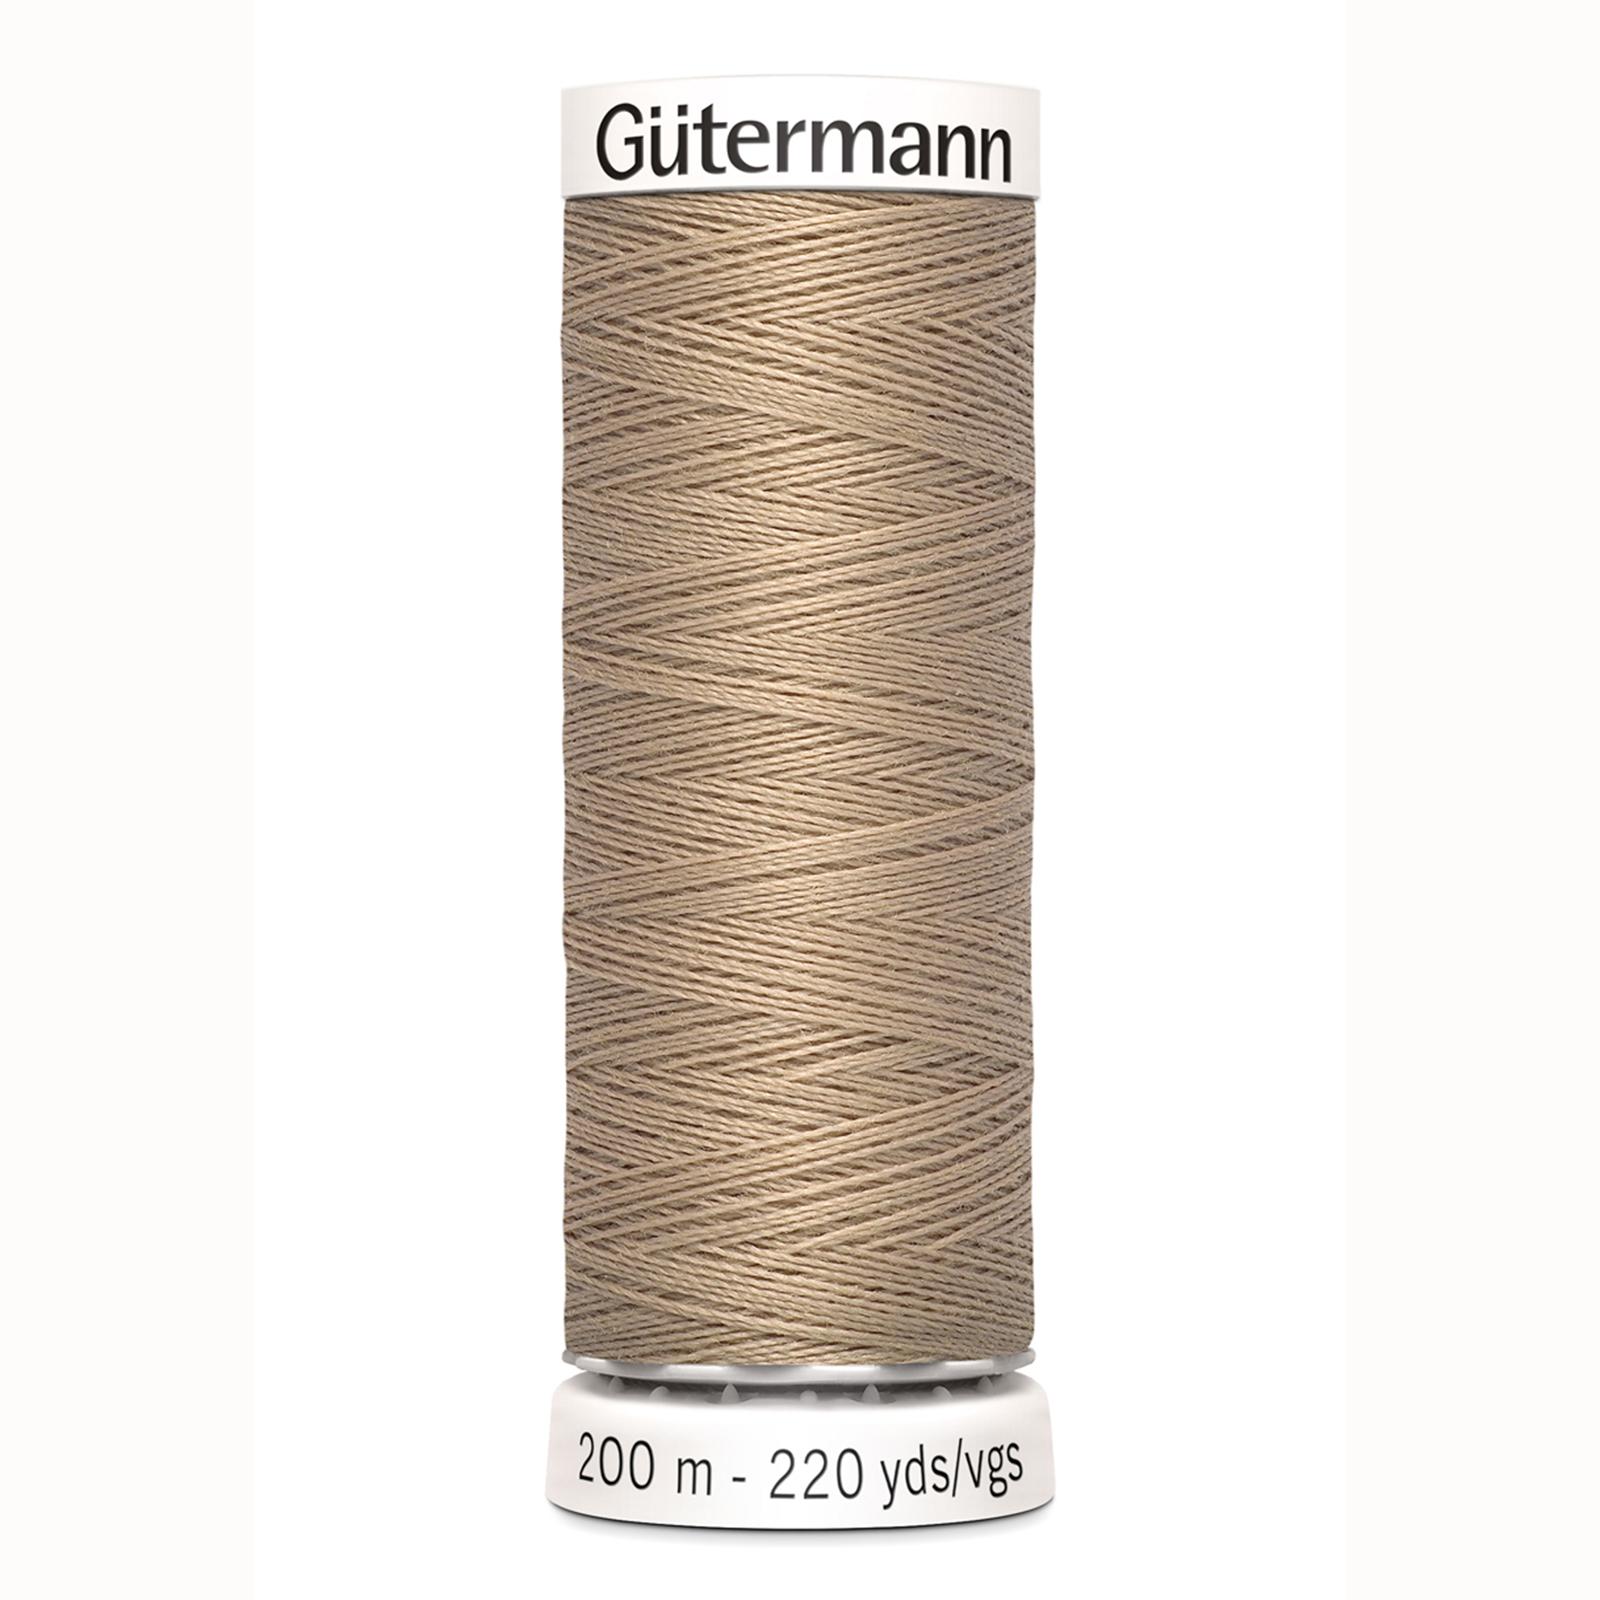 Gutermann Polyestr 200m-215